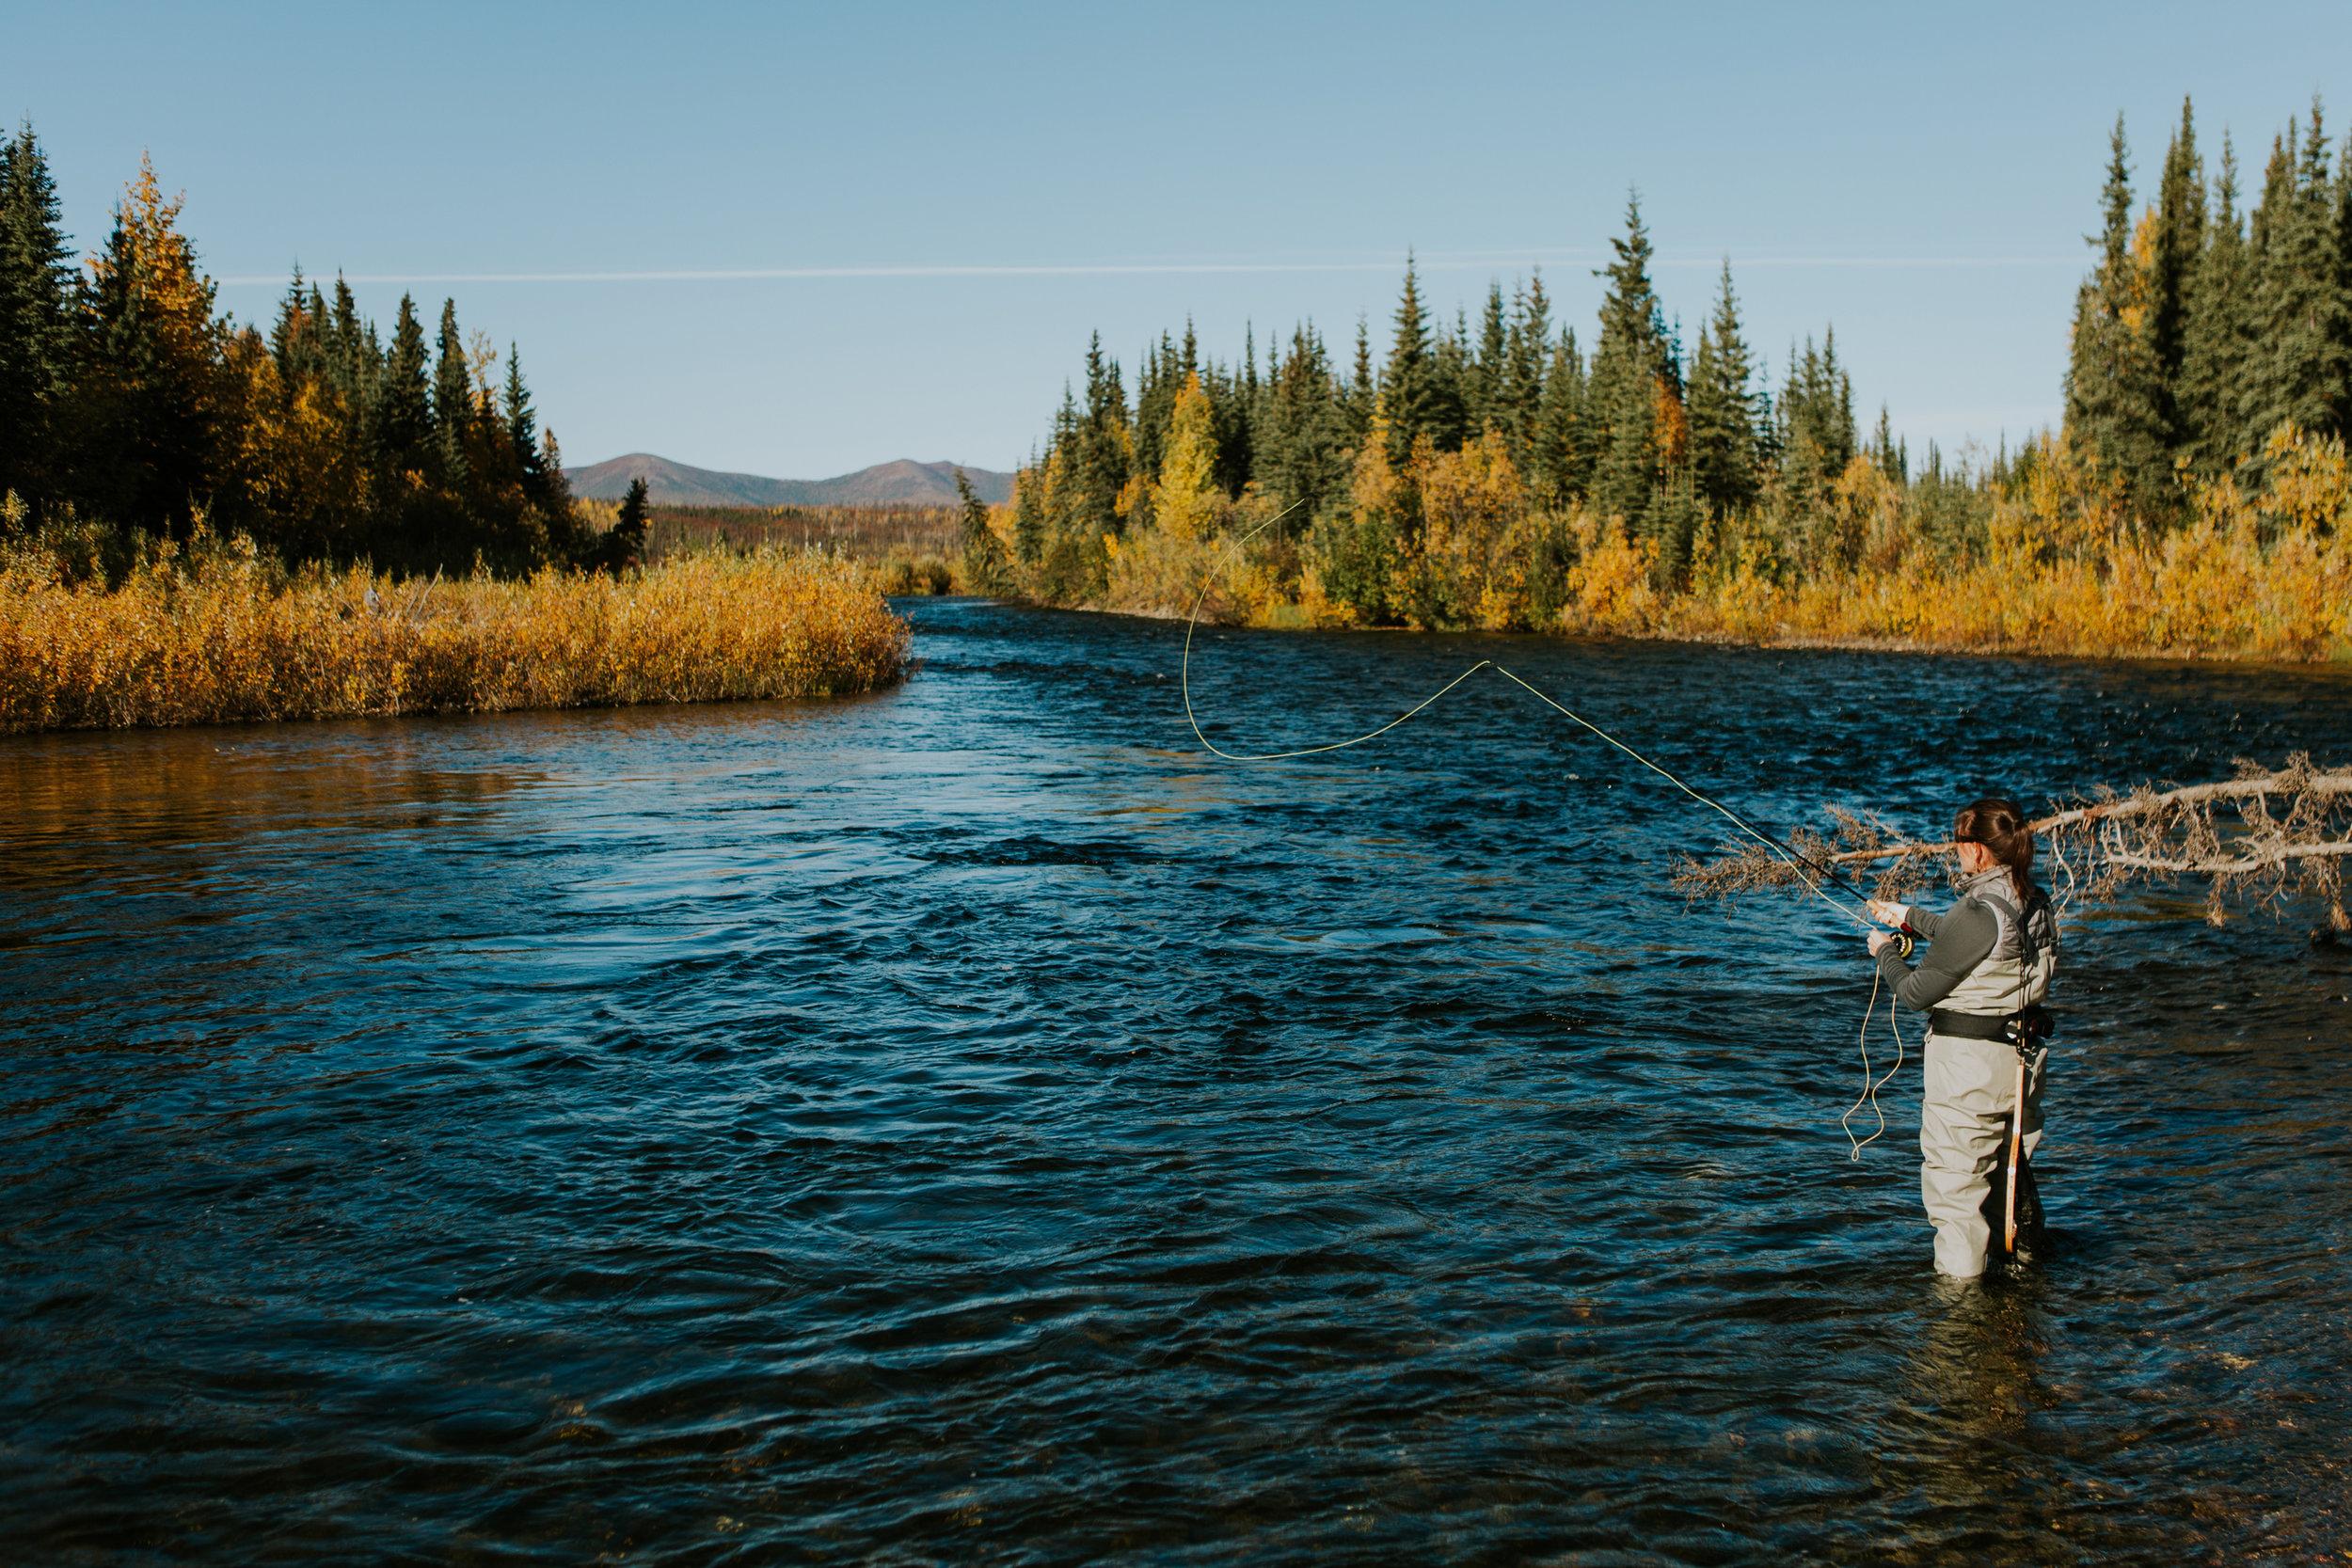 CindyGiovagnoli_Alaska_KoyukukRiver_SukakpakMountain_JimRiver_ArcticCircle_fly_fishing_September-063.jpg